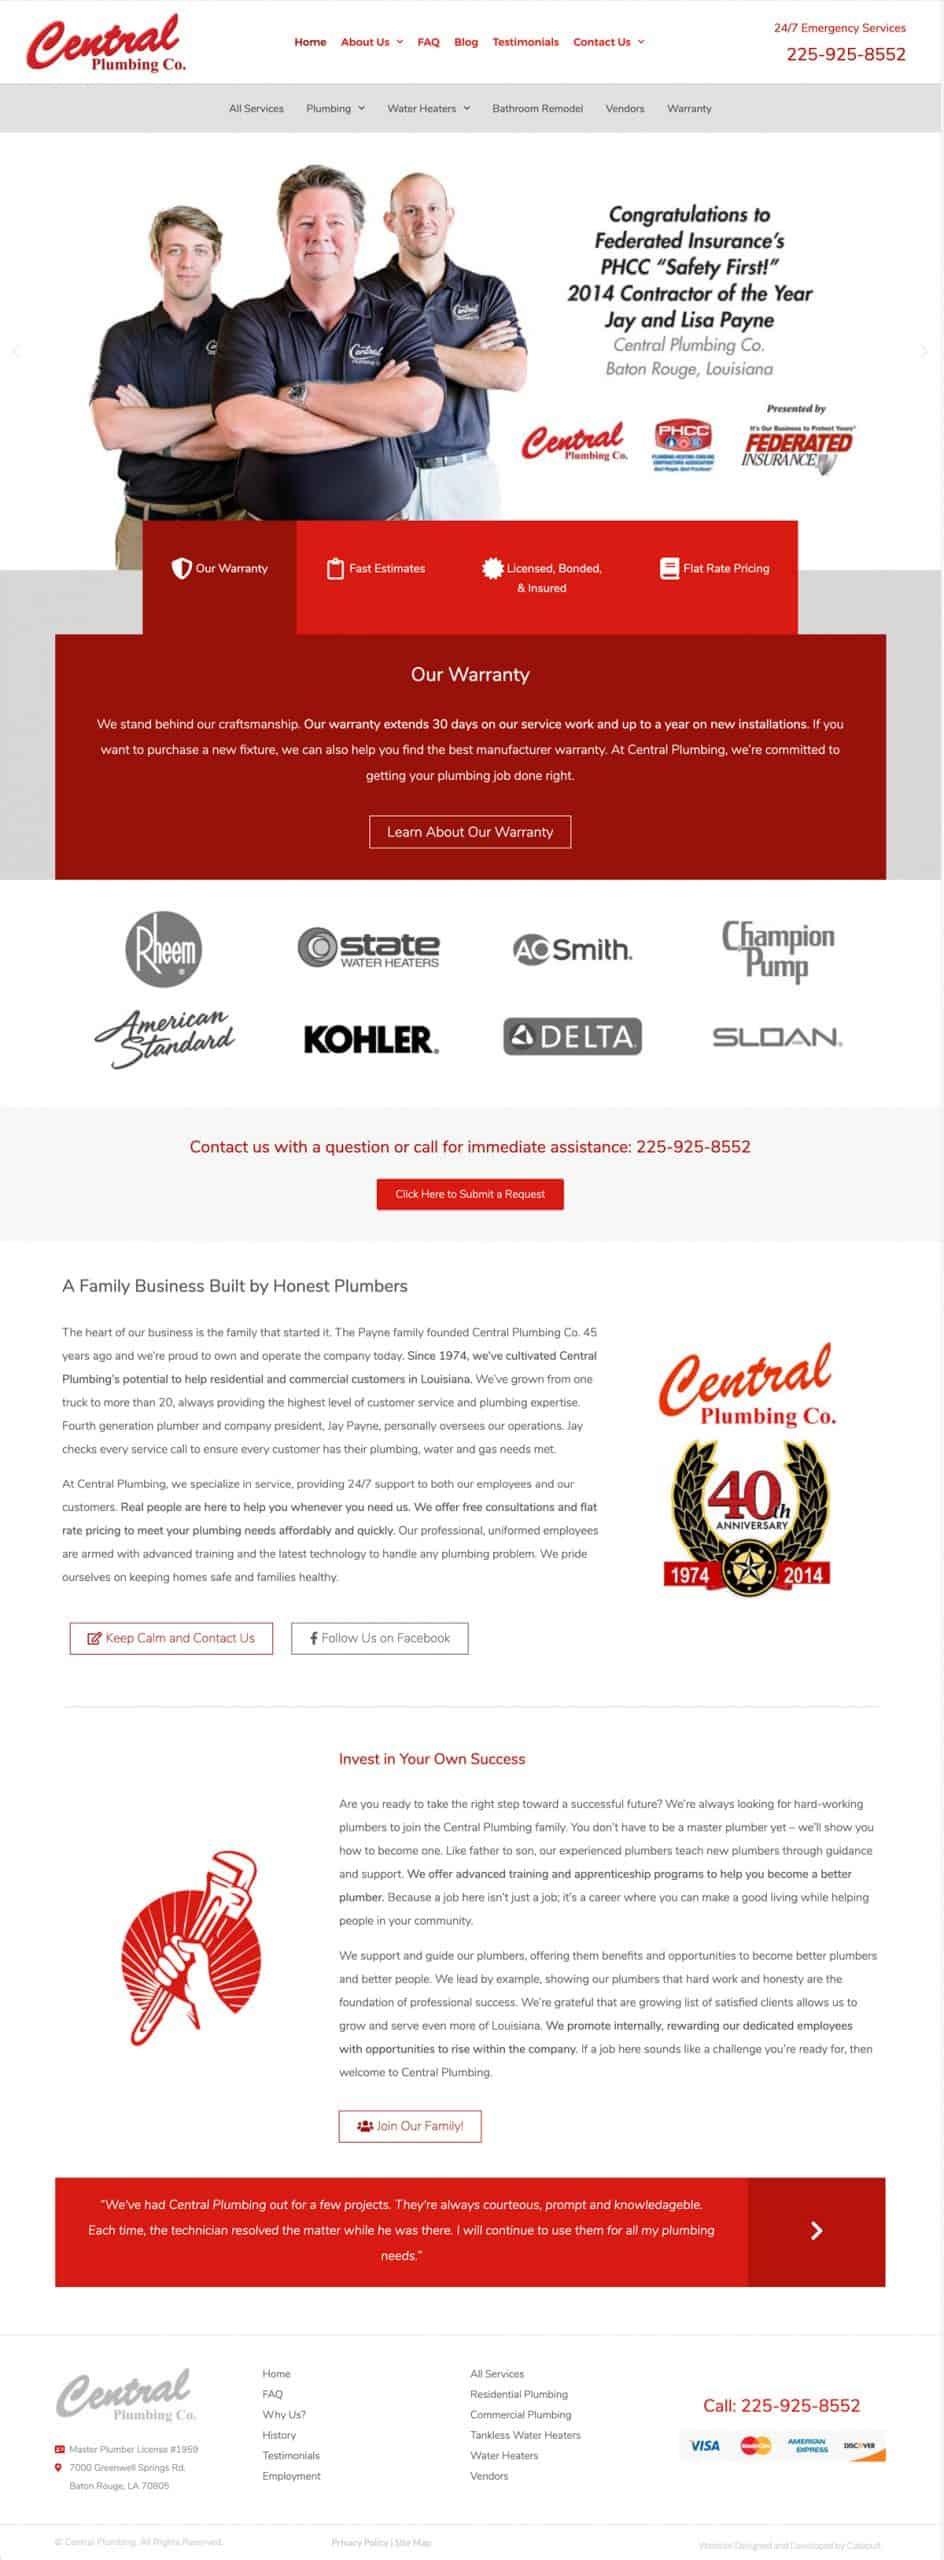 01 01 CentralPlumbing WebsiteLayout scaled